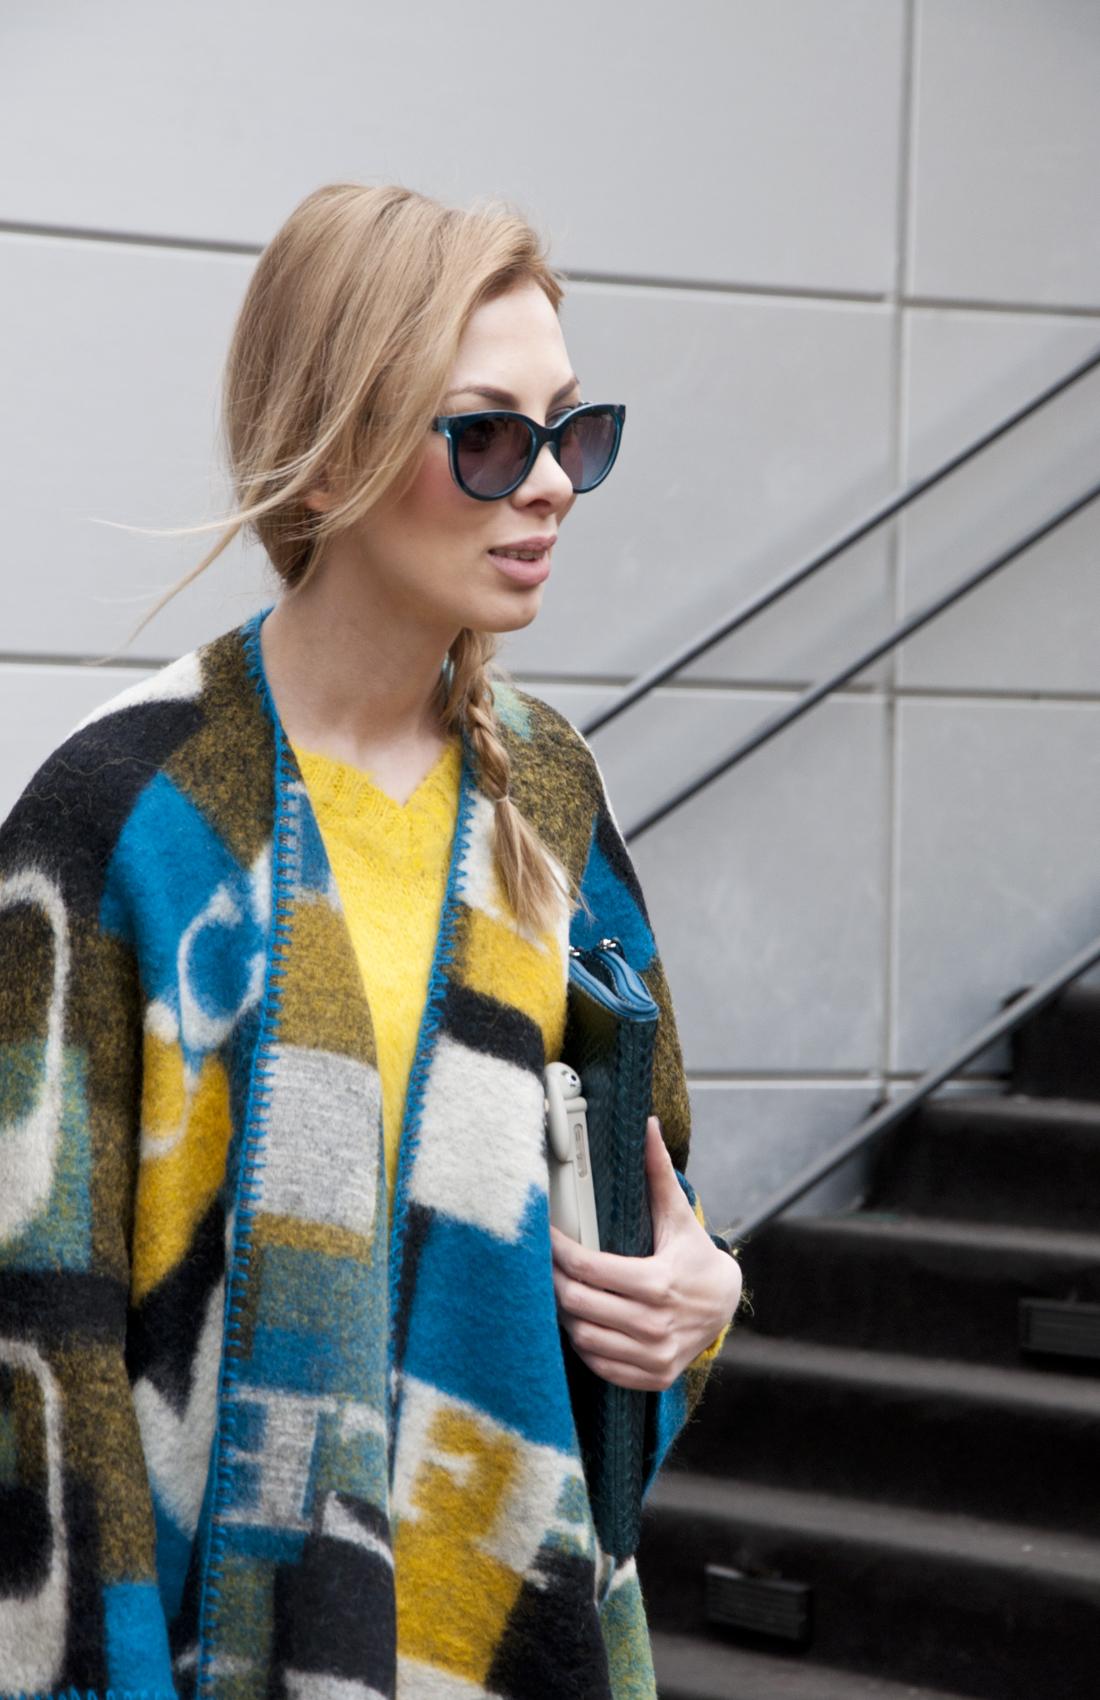 Karolina Gliniecka wearing Vogue eyewear - pretty convinced she's Taylor Swift's long lost twin sister